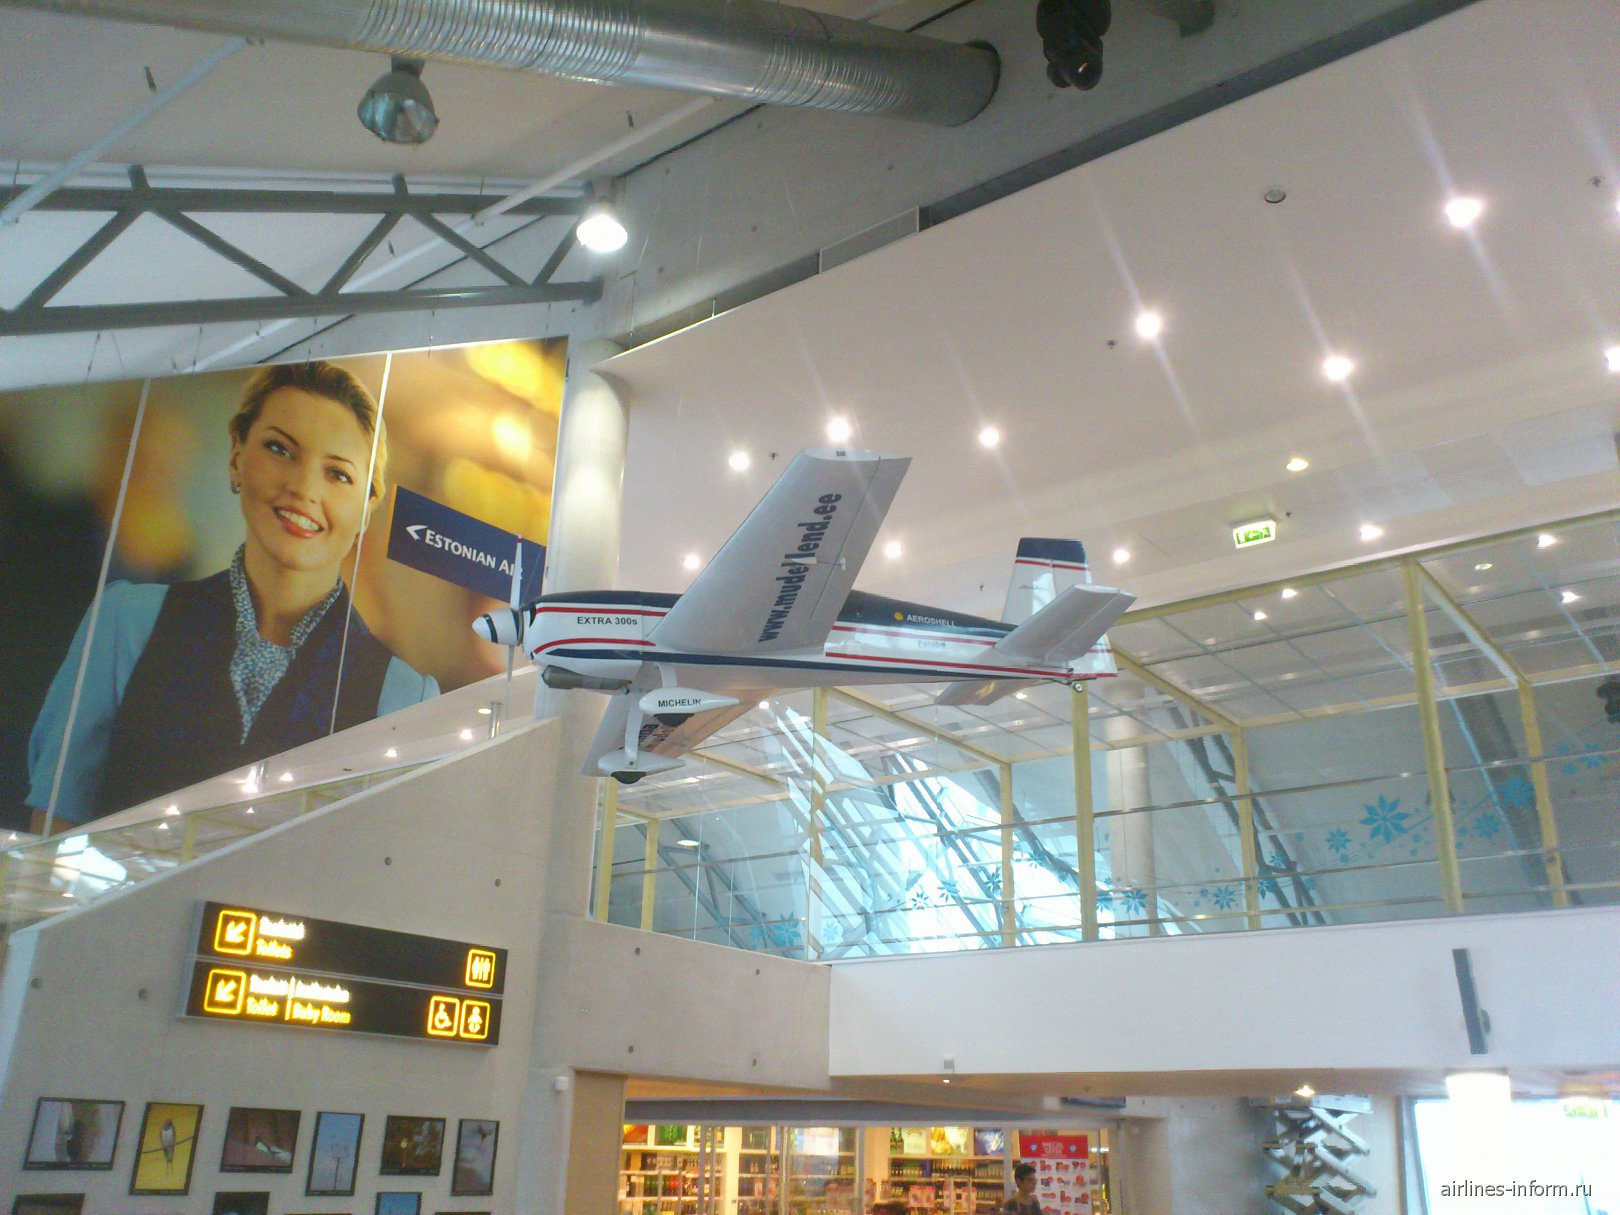 Макет самолета в аэропорту Таллинн